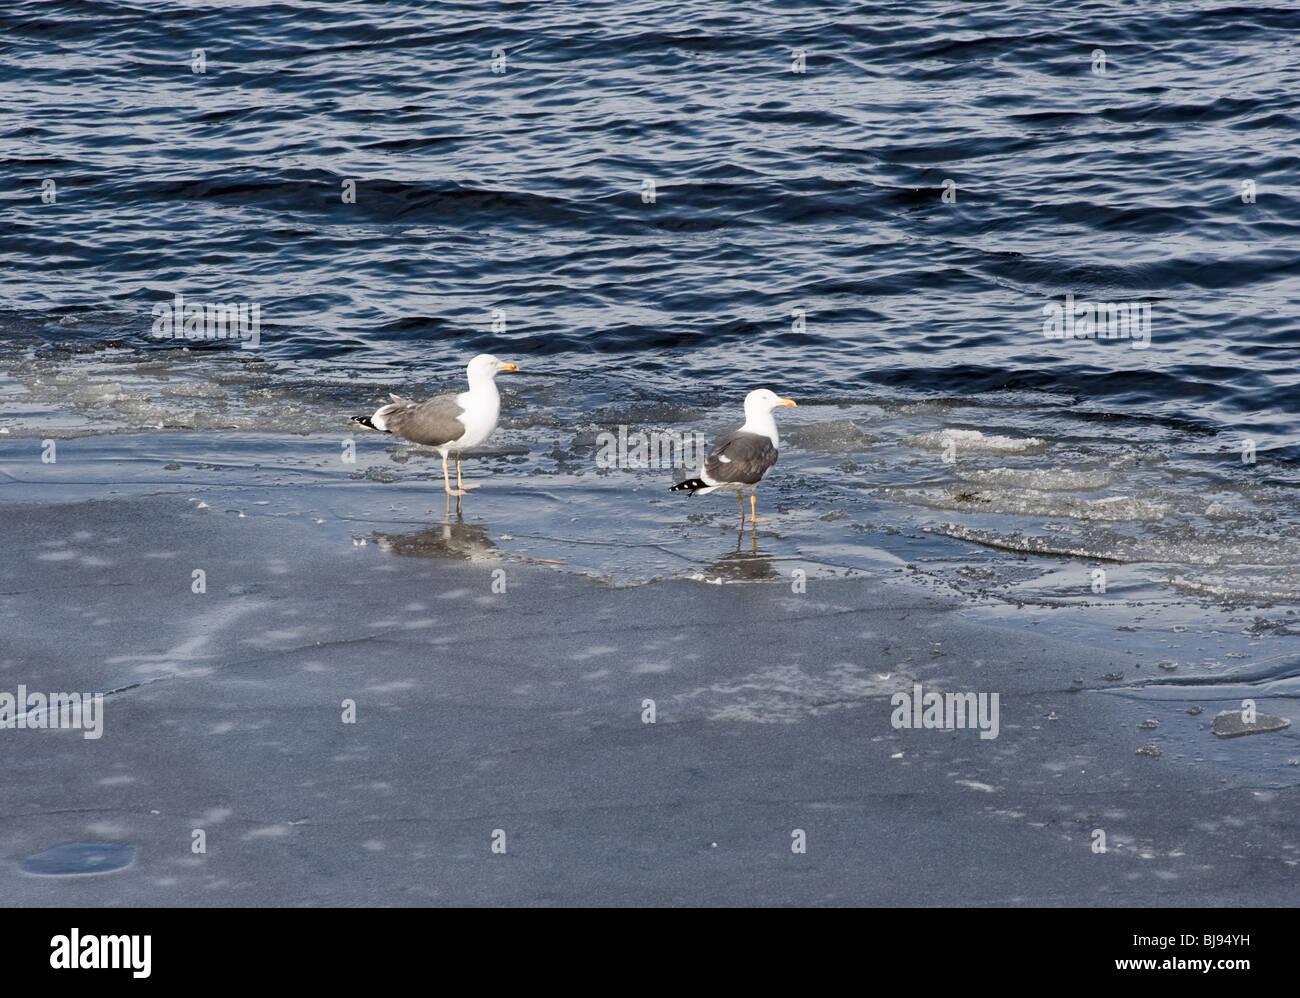 A Pair of Herring Gulls Standing on Ice at Loch Lomond Balloch Dumbartonshire Scotland United Kingdom UK - Stock Image